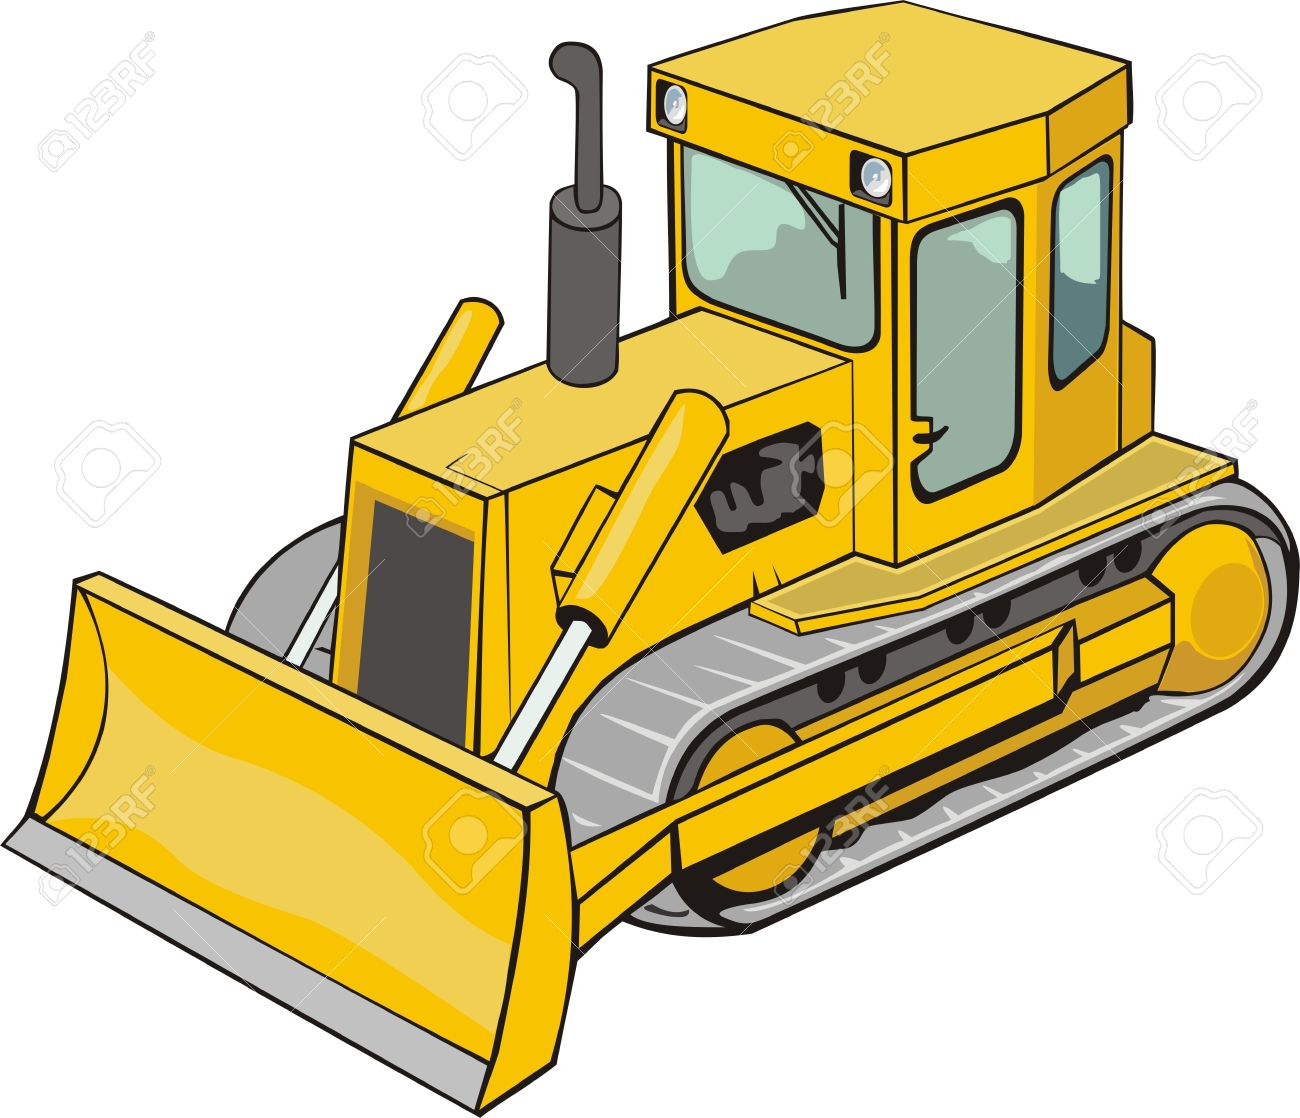 Bulldozers clipart - Clipground